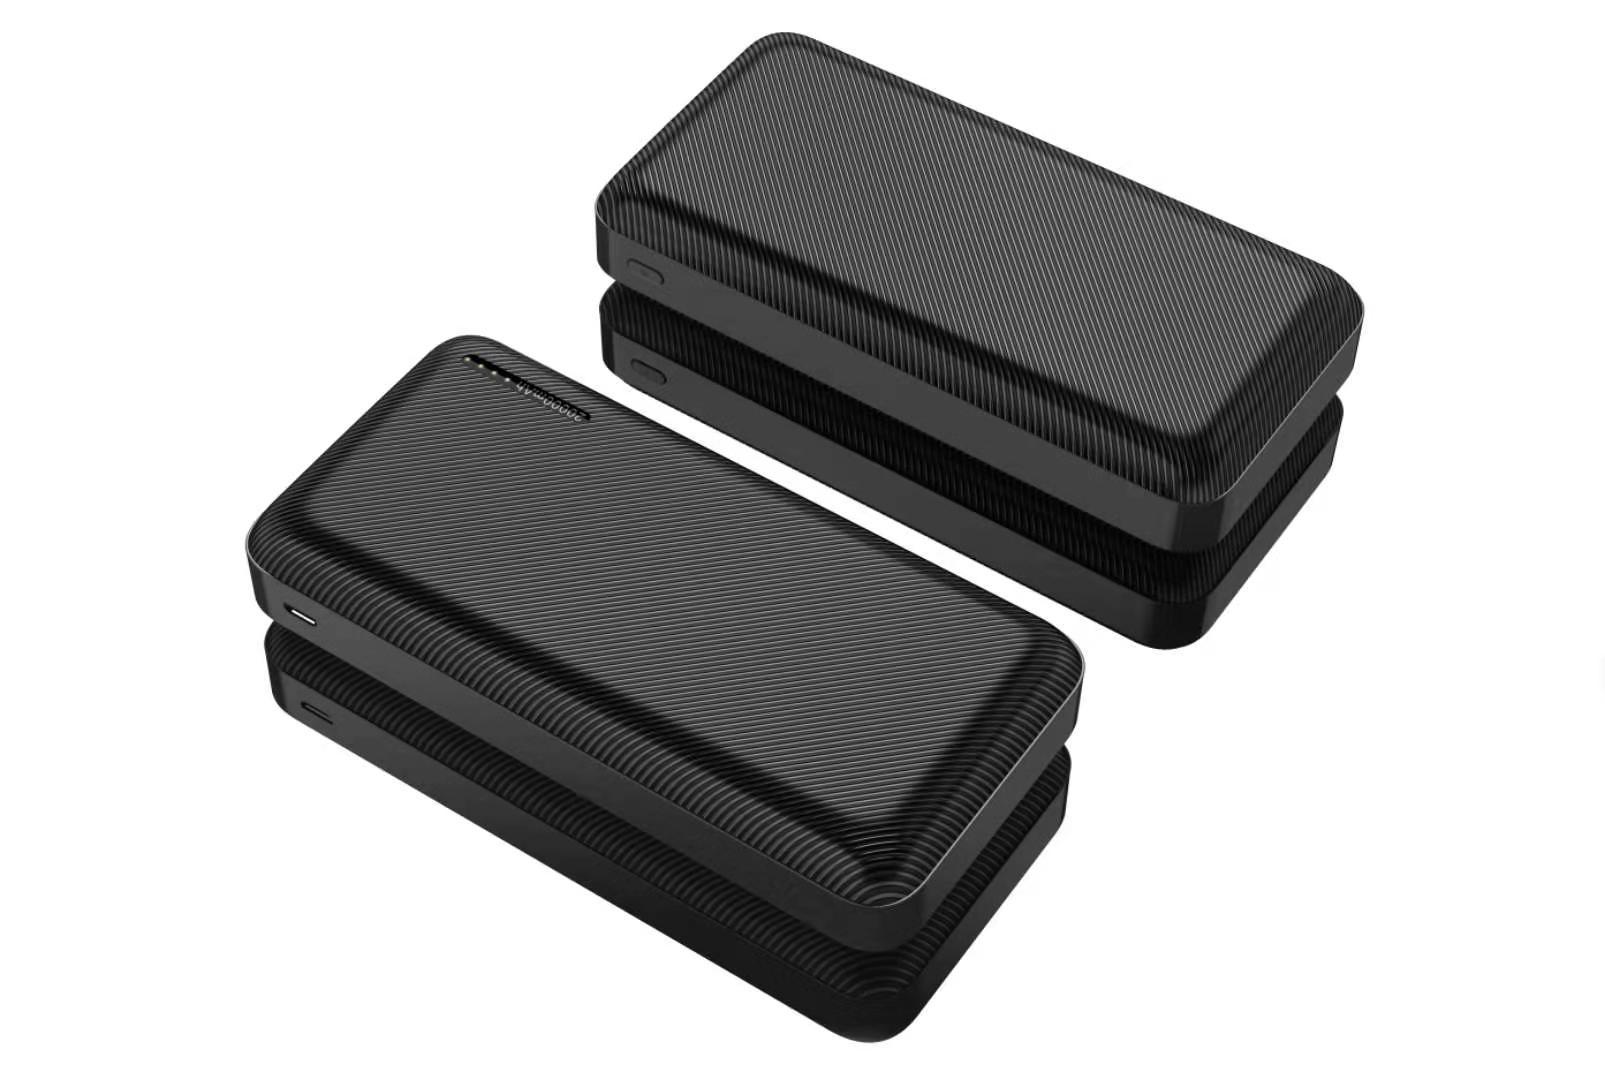 Techplus portable power bank 20000mAh dual USB